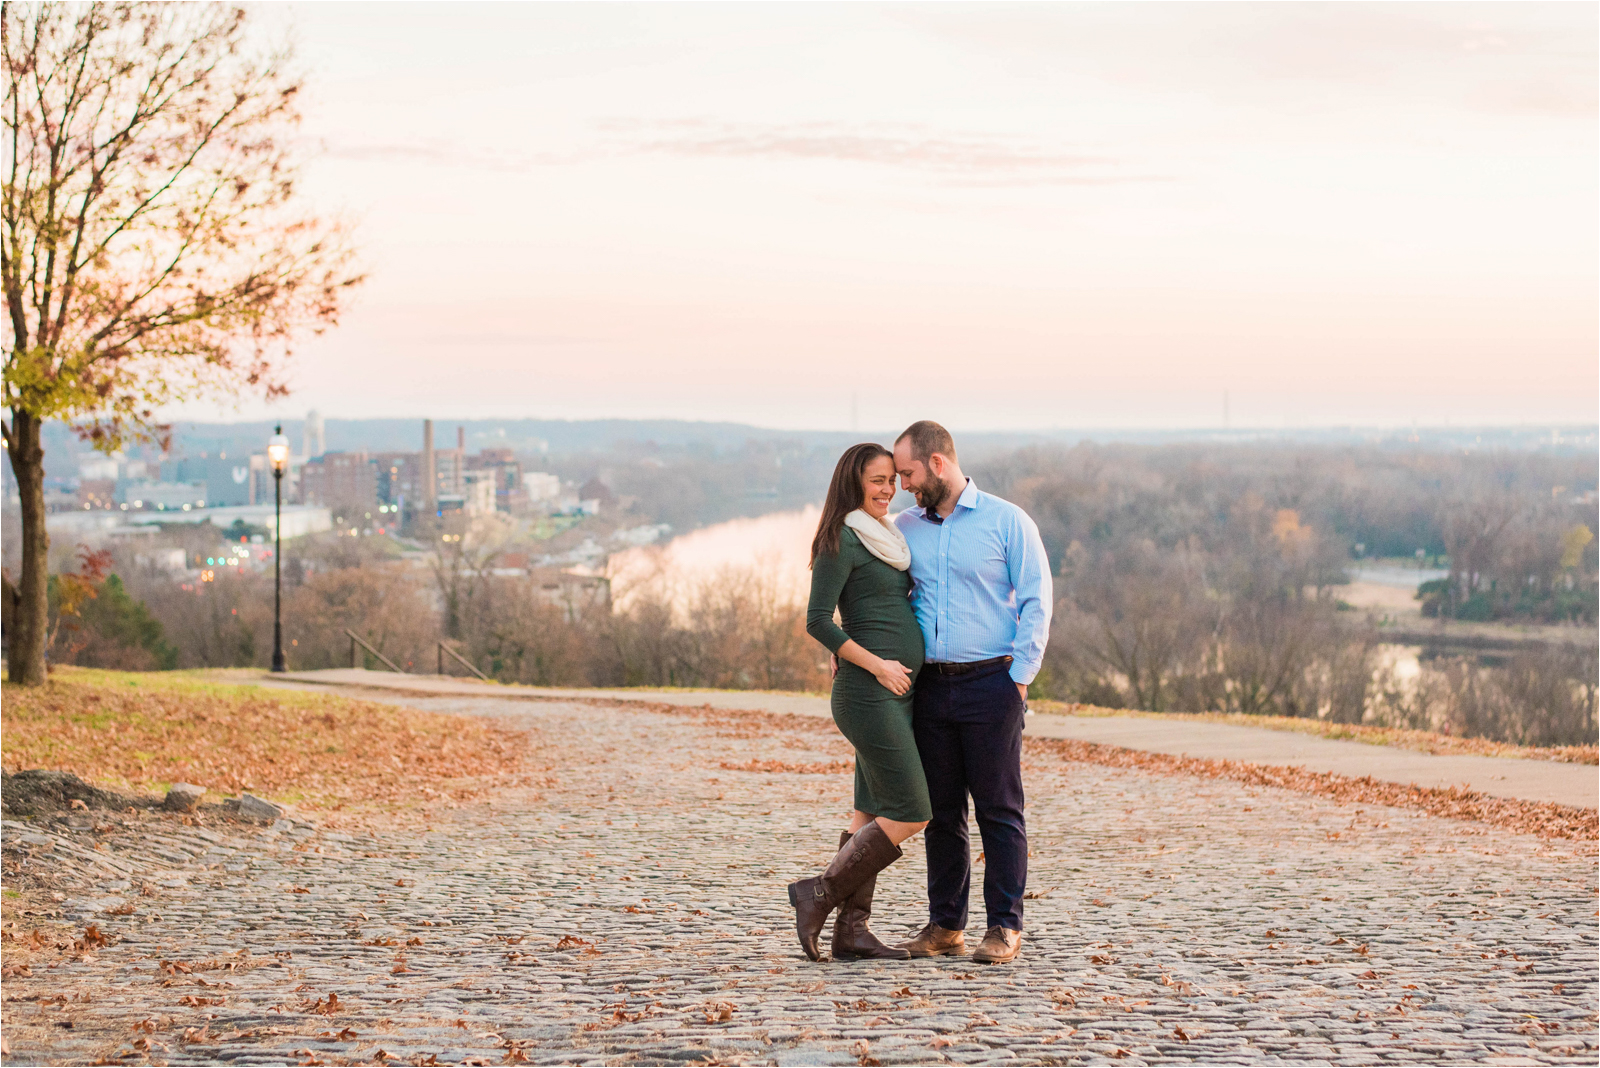 pregnancy-reveal-photography-session-husband-wife-green-dress-blue-shirt-navy-pants-sonogram-jessica-capozzola-libby-hill-park-richmond-va-rva